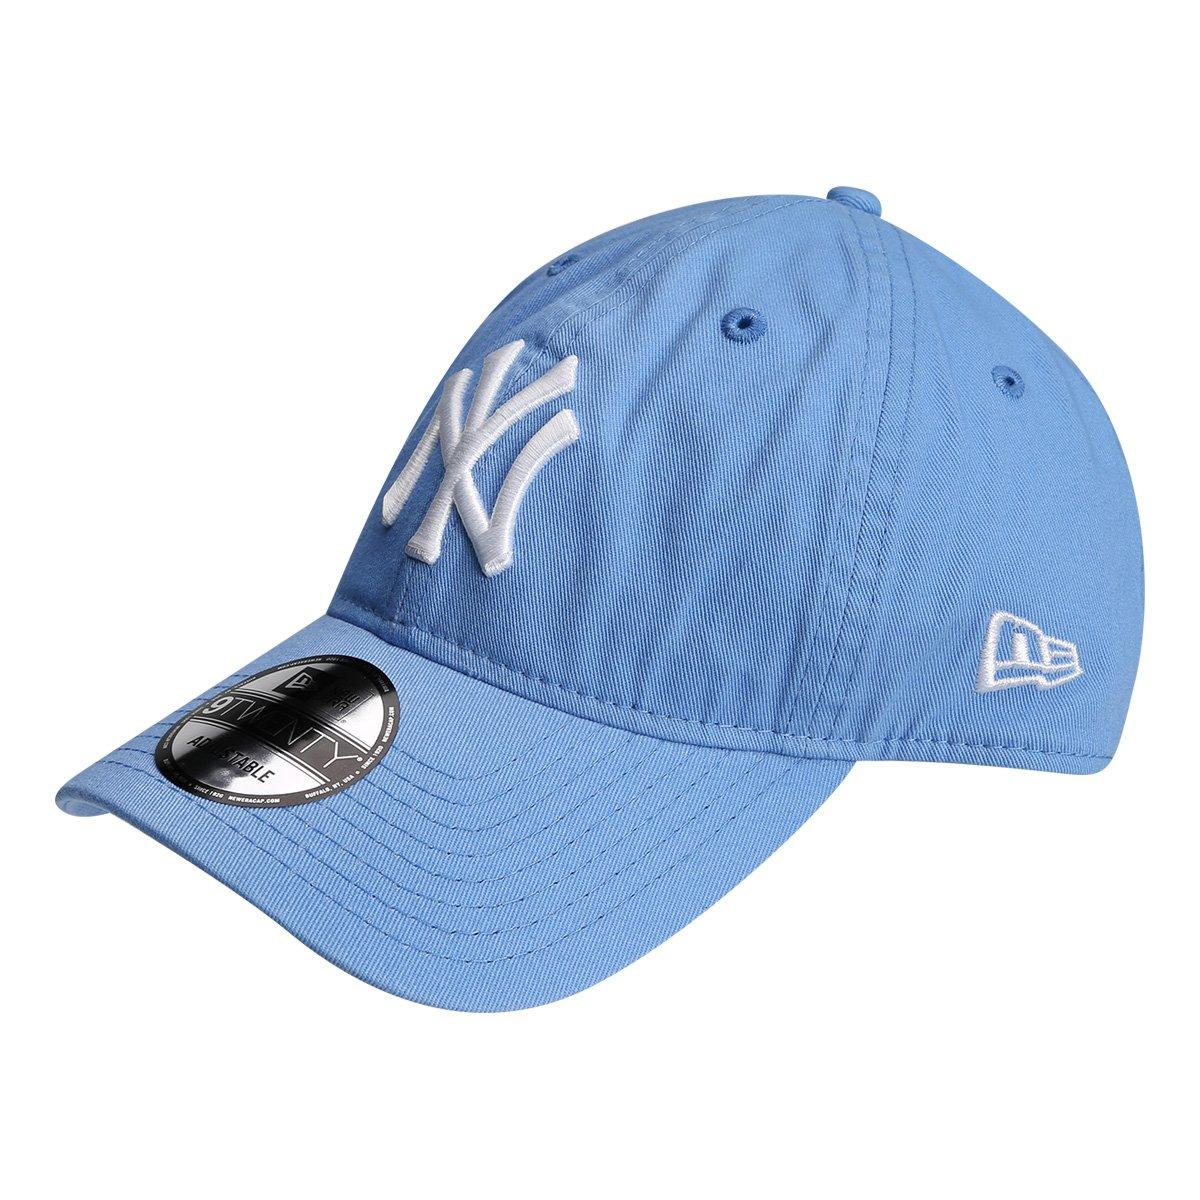 Boné New Era NFL New York Yankees Aba Curva 920 St Pastels Masculino ... 1a9859d9ecded